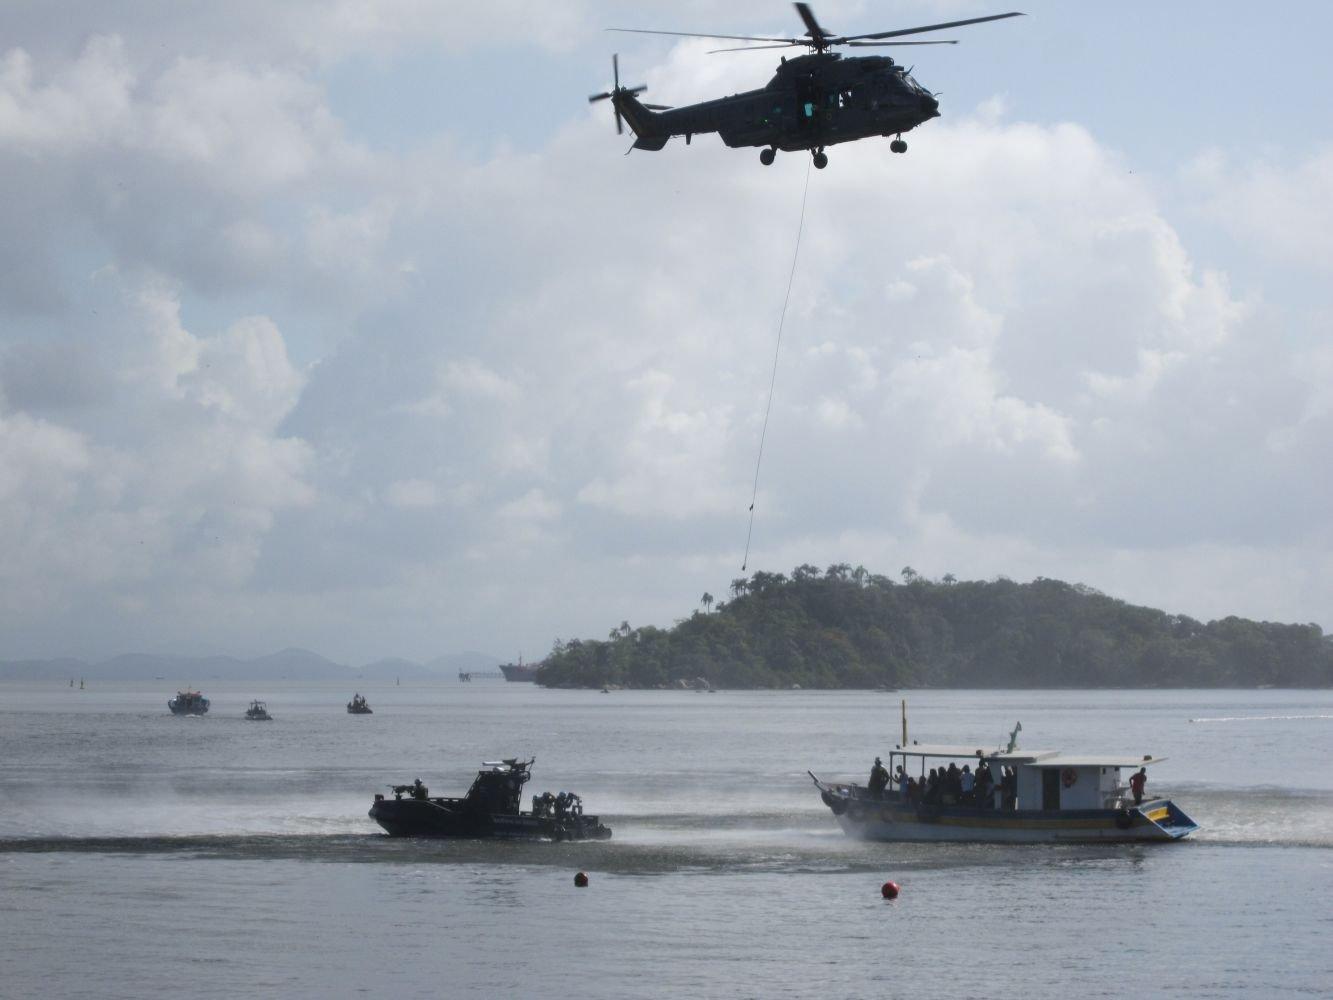 Seminar Weighs 13 Years of Brazilian Operations in Haiti